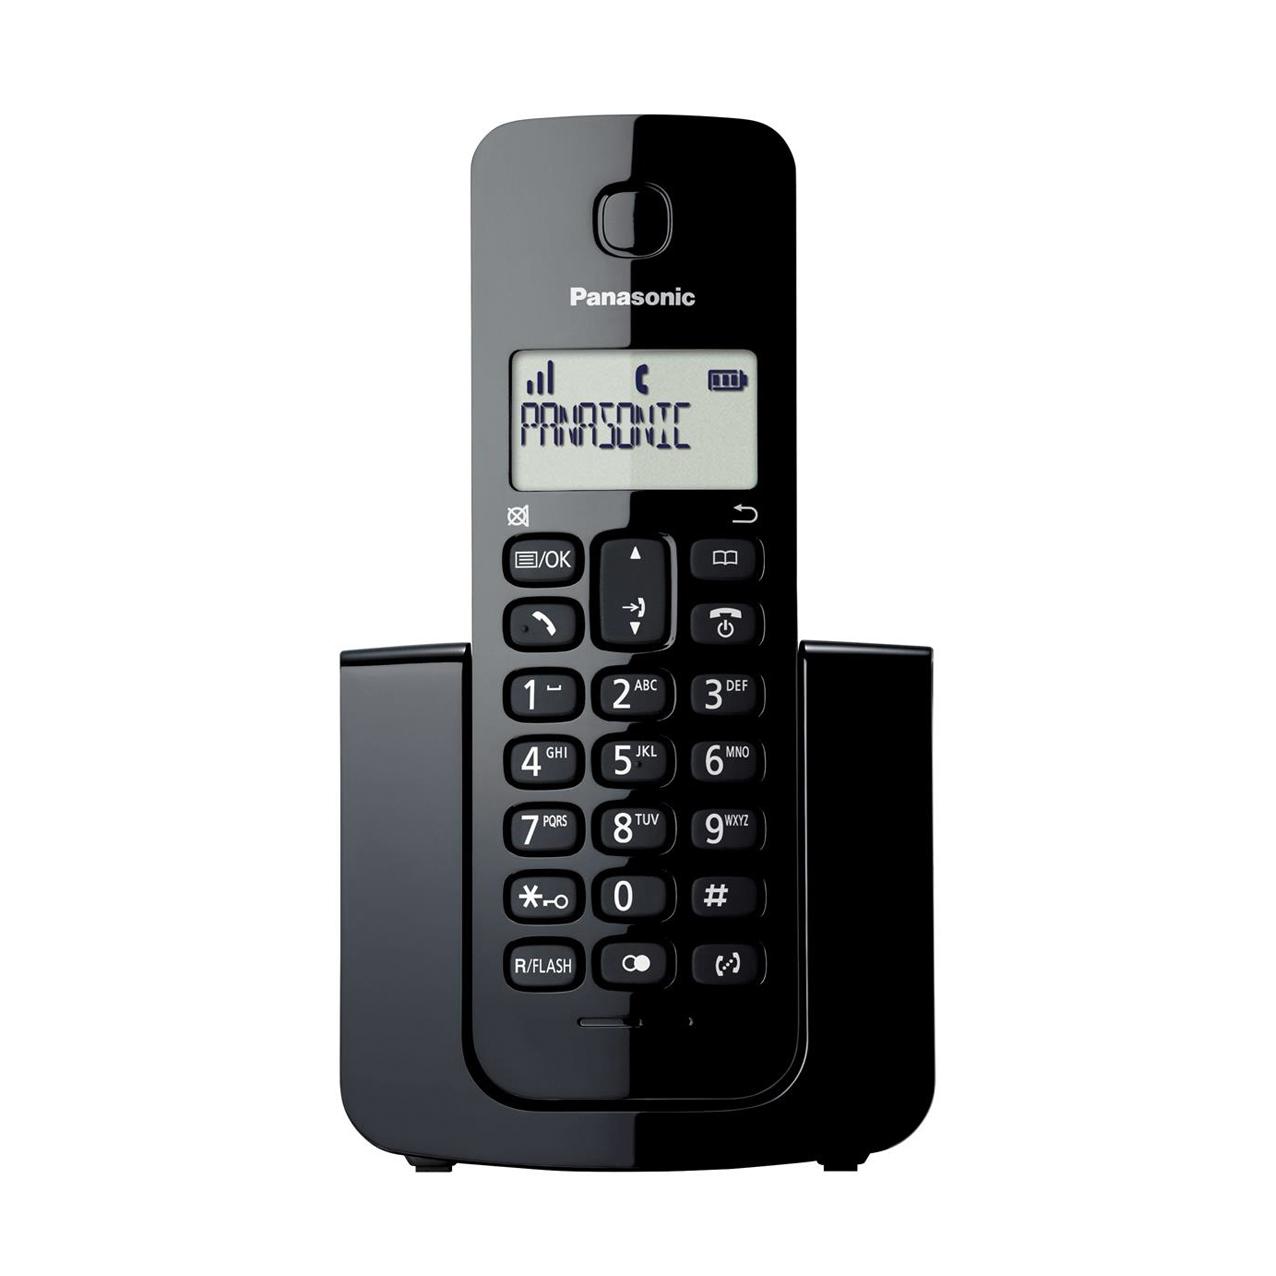 تلفن بیسیم پاناسونیک مدل Panasonic-KX-TGB110-112